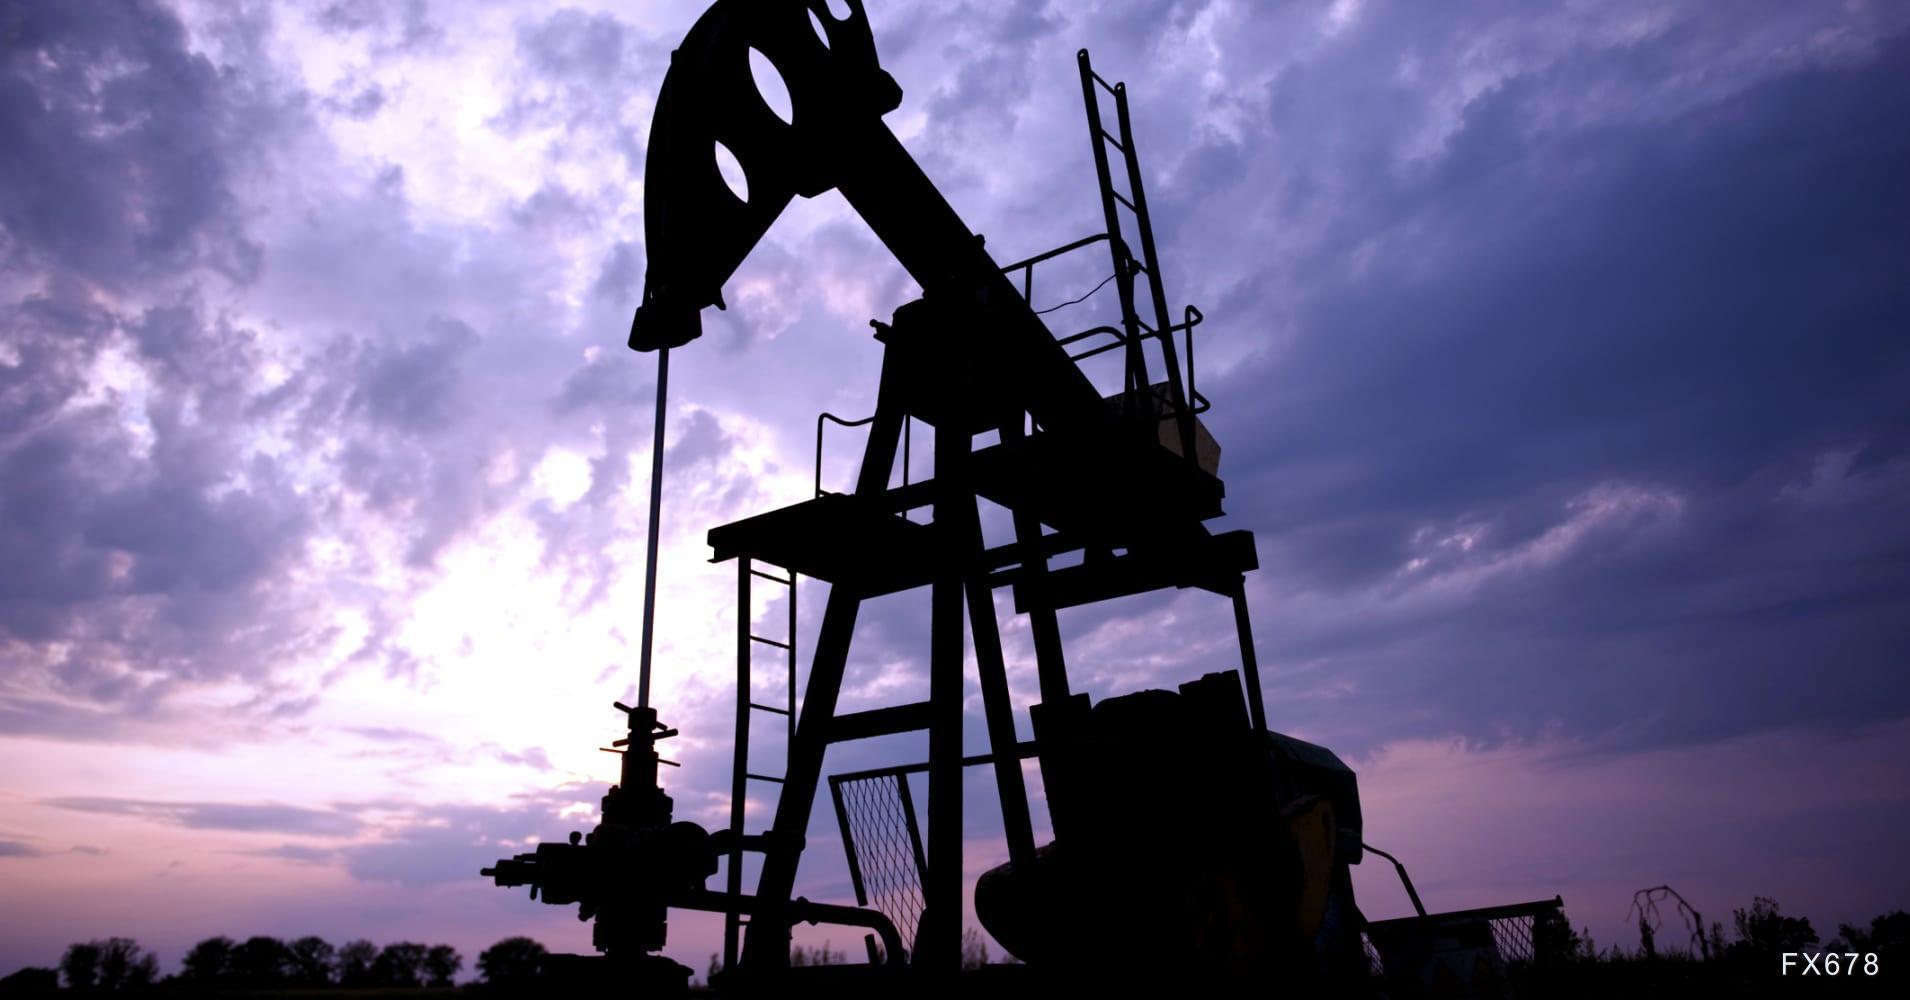 INE原油上漲,創逾16個月新高,夏季駕車旺季將至